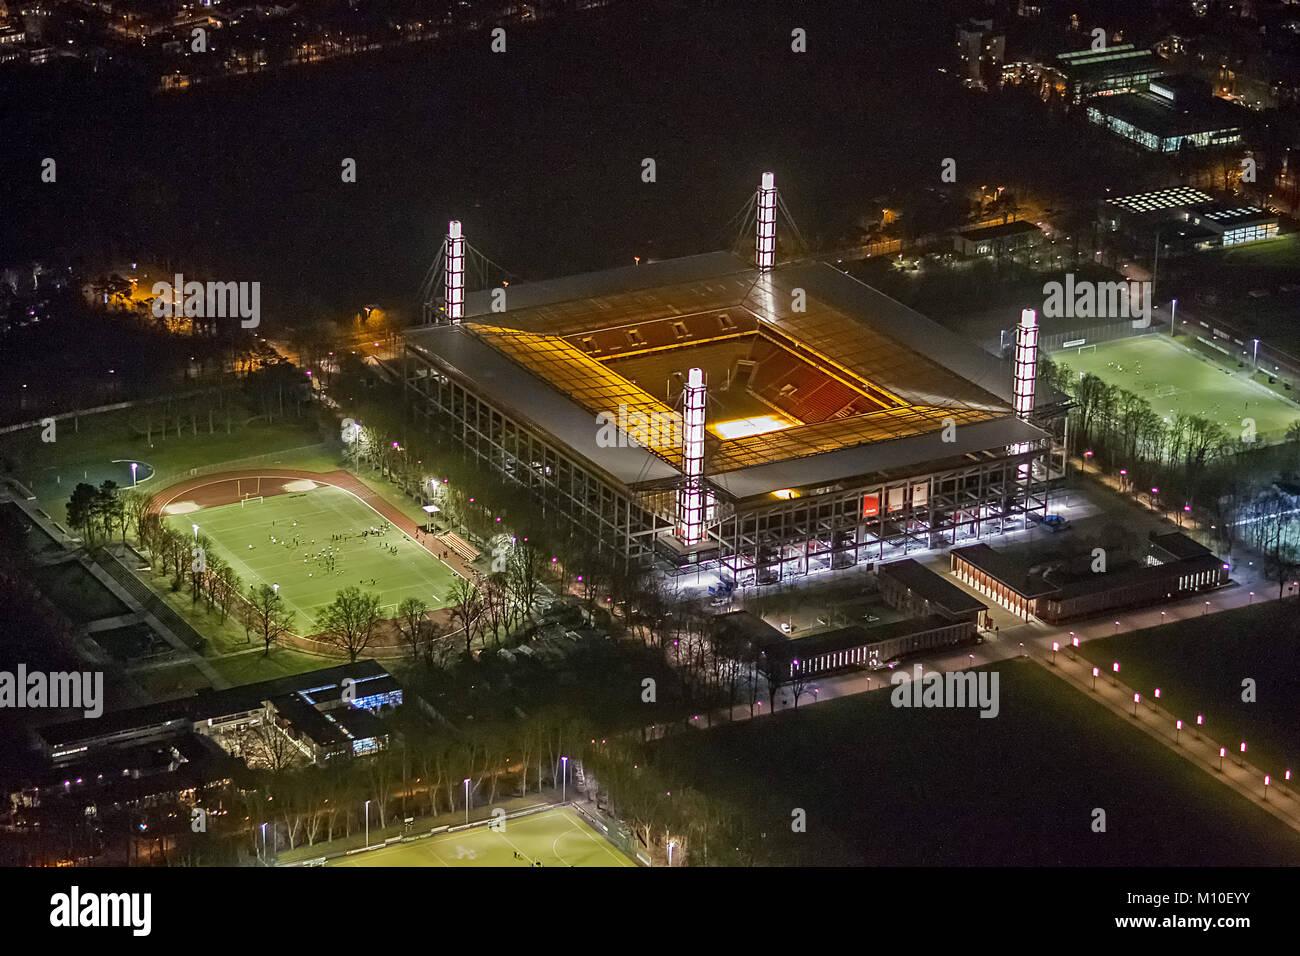 Luftbild, RheinEnergieStadion, Müngersdorfer Stadion, 1. FC Köln , Bundesligastadion bei Nacht, Nachtaufnahme, - Stock Image